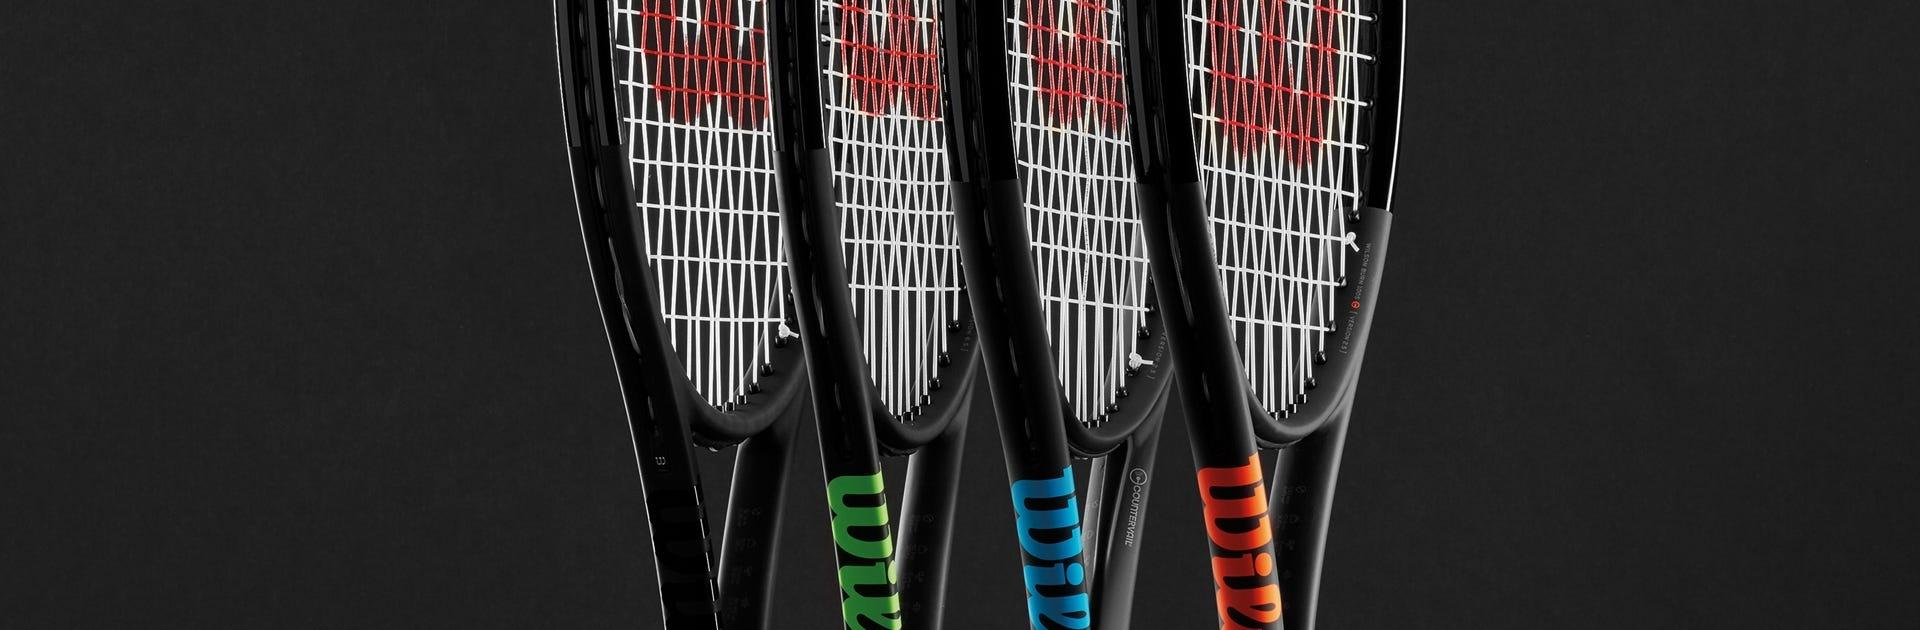 Black Edition Tennis Rackets | Wilson Sporting Goods